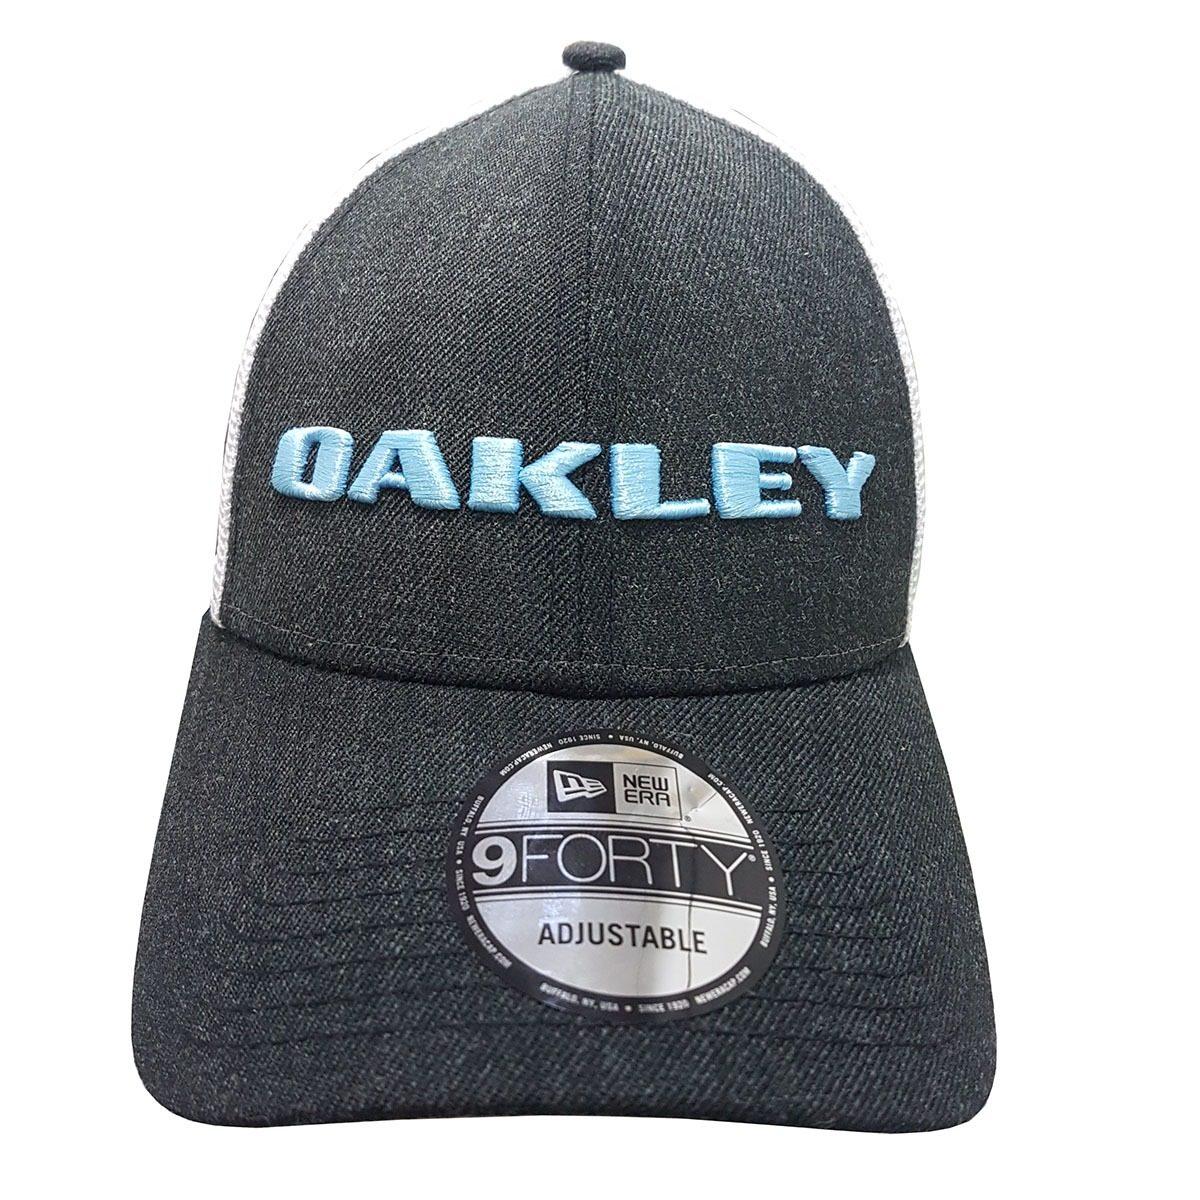 Boné Oakley Heather New Era Original (911523-6cr) - R  153 9a8c4612158